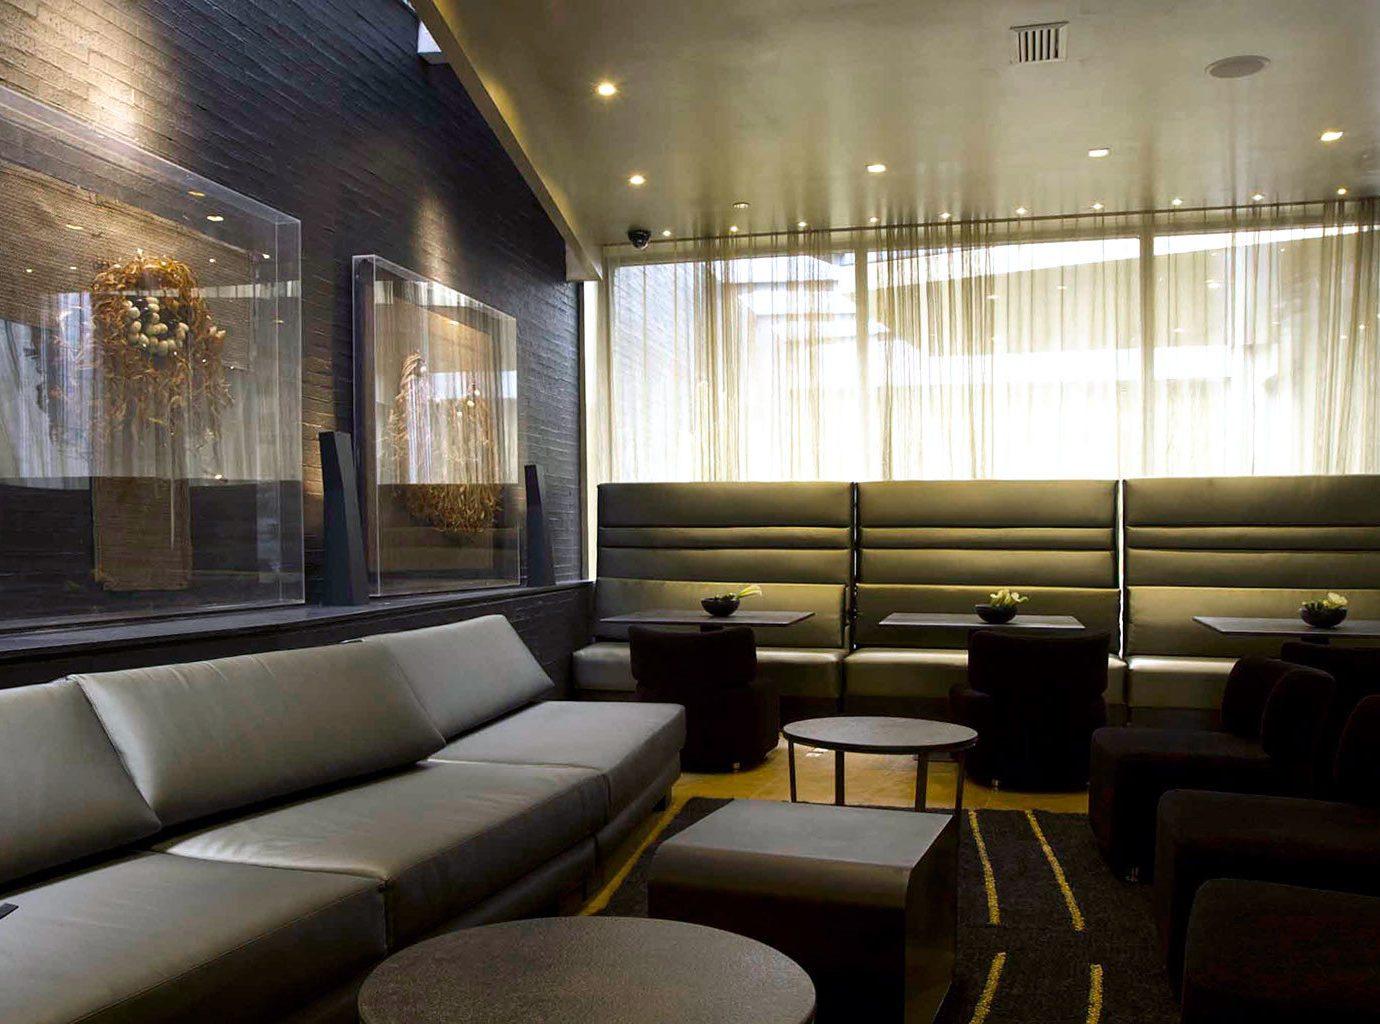 Lounge Luxury sofa Lobby living room lighting auditorium